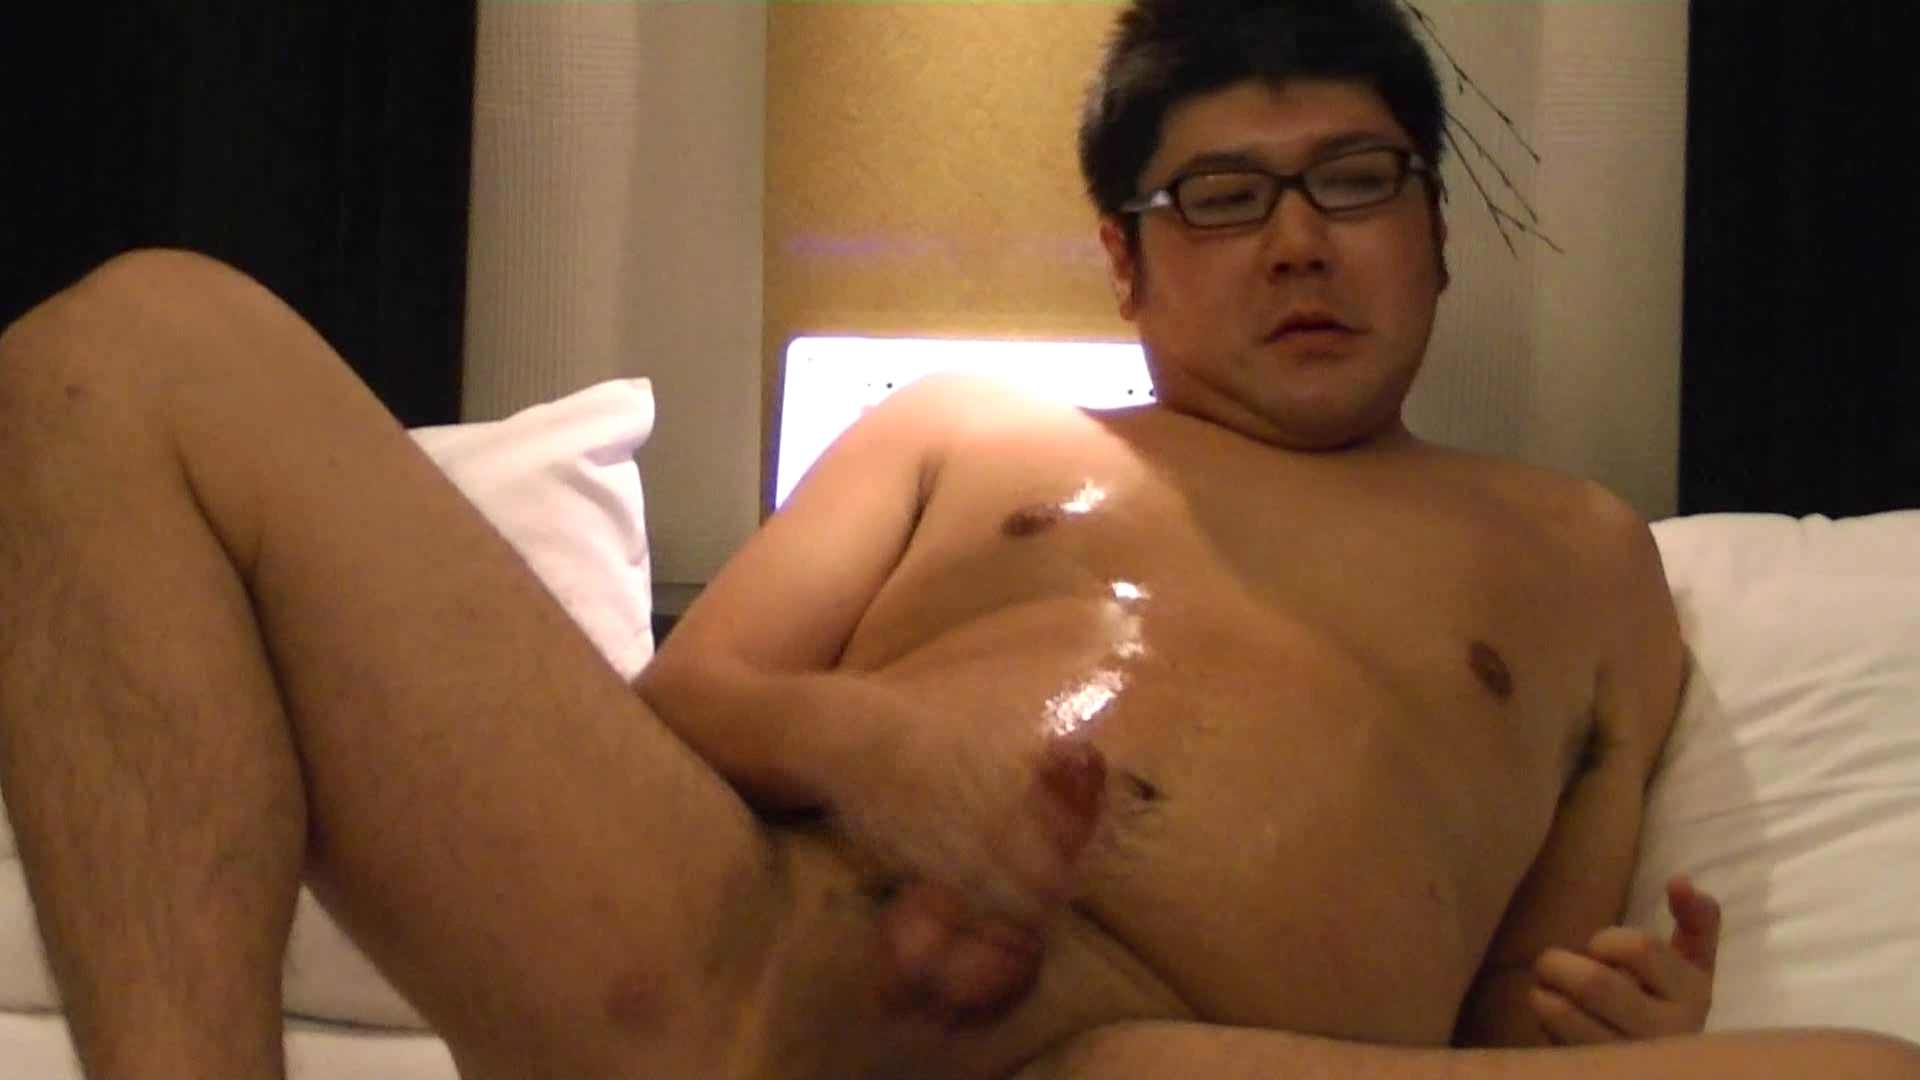 Mr.オナックスさん投稿!HD 貴方のオナニー三万円で撮影させてください。VOL.03 後編 投稿 ゲイ無修正ビデオ画像 106枚 45